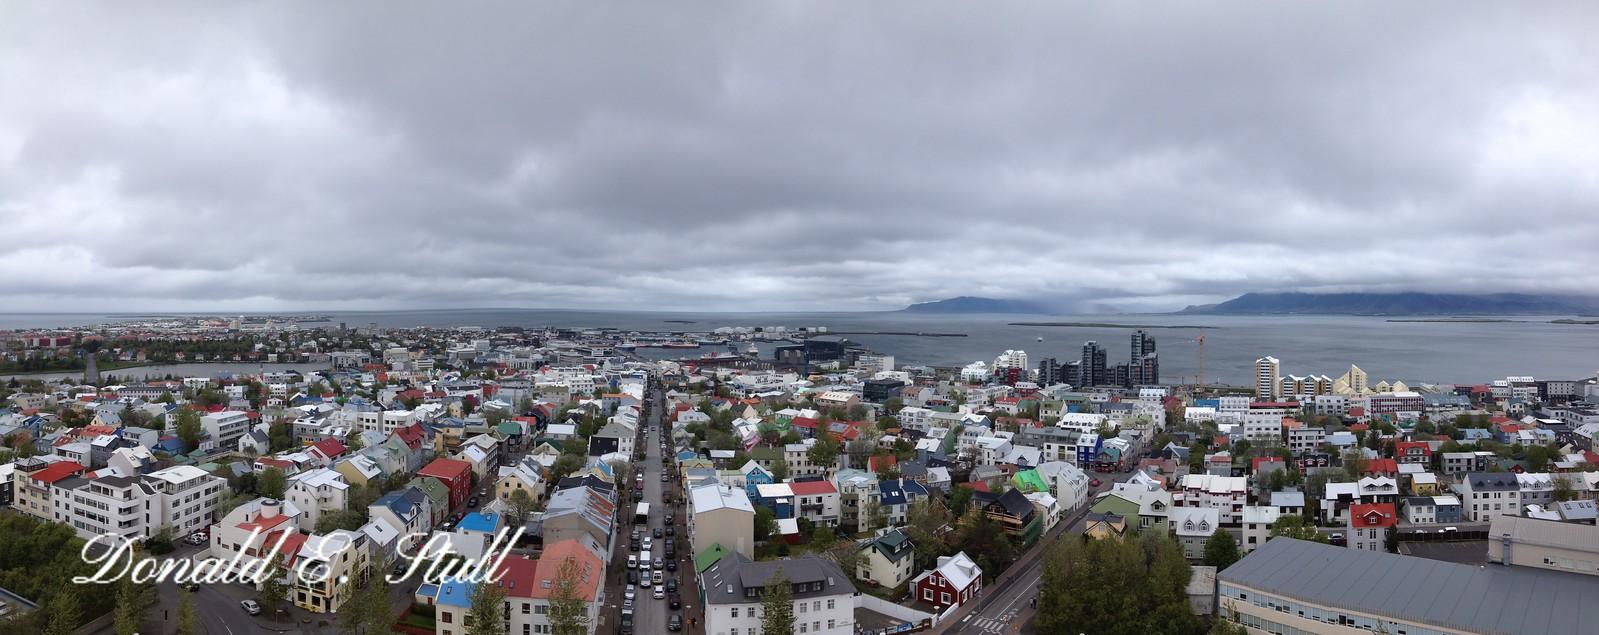 Downtown Reykjavik, from the top of Hallgrimmskirkja